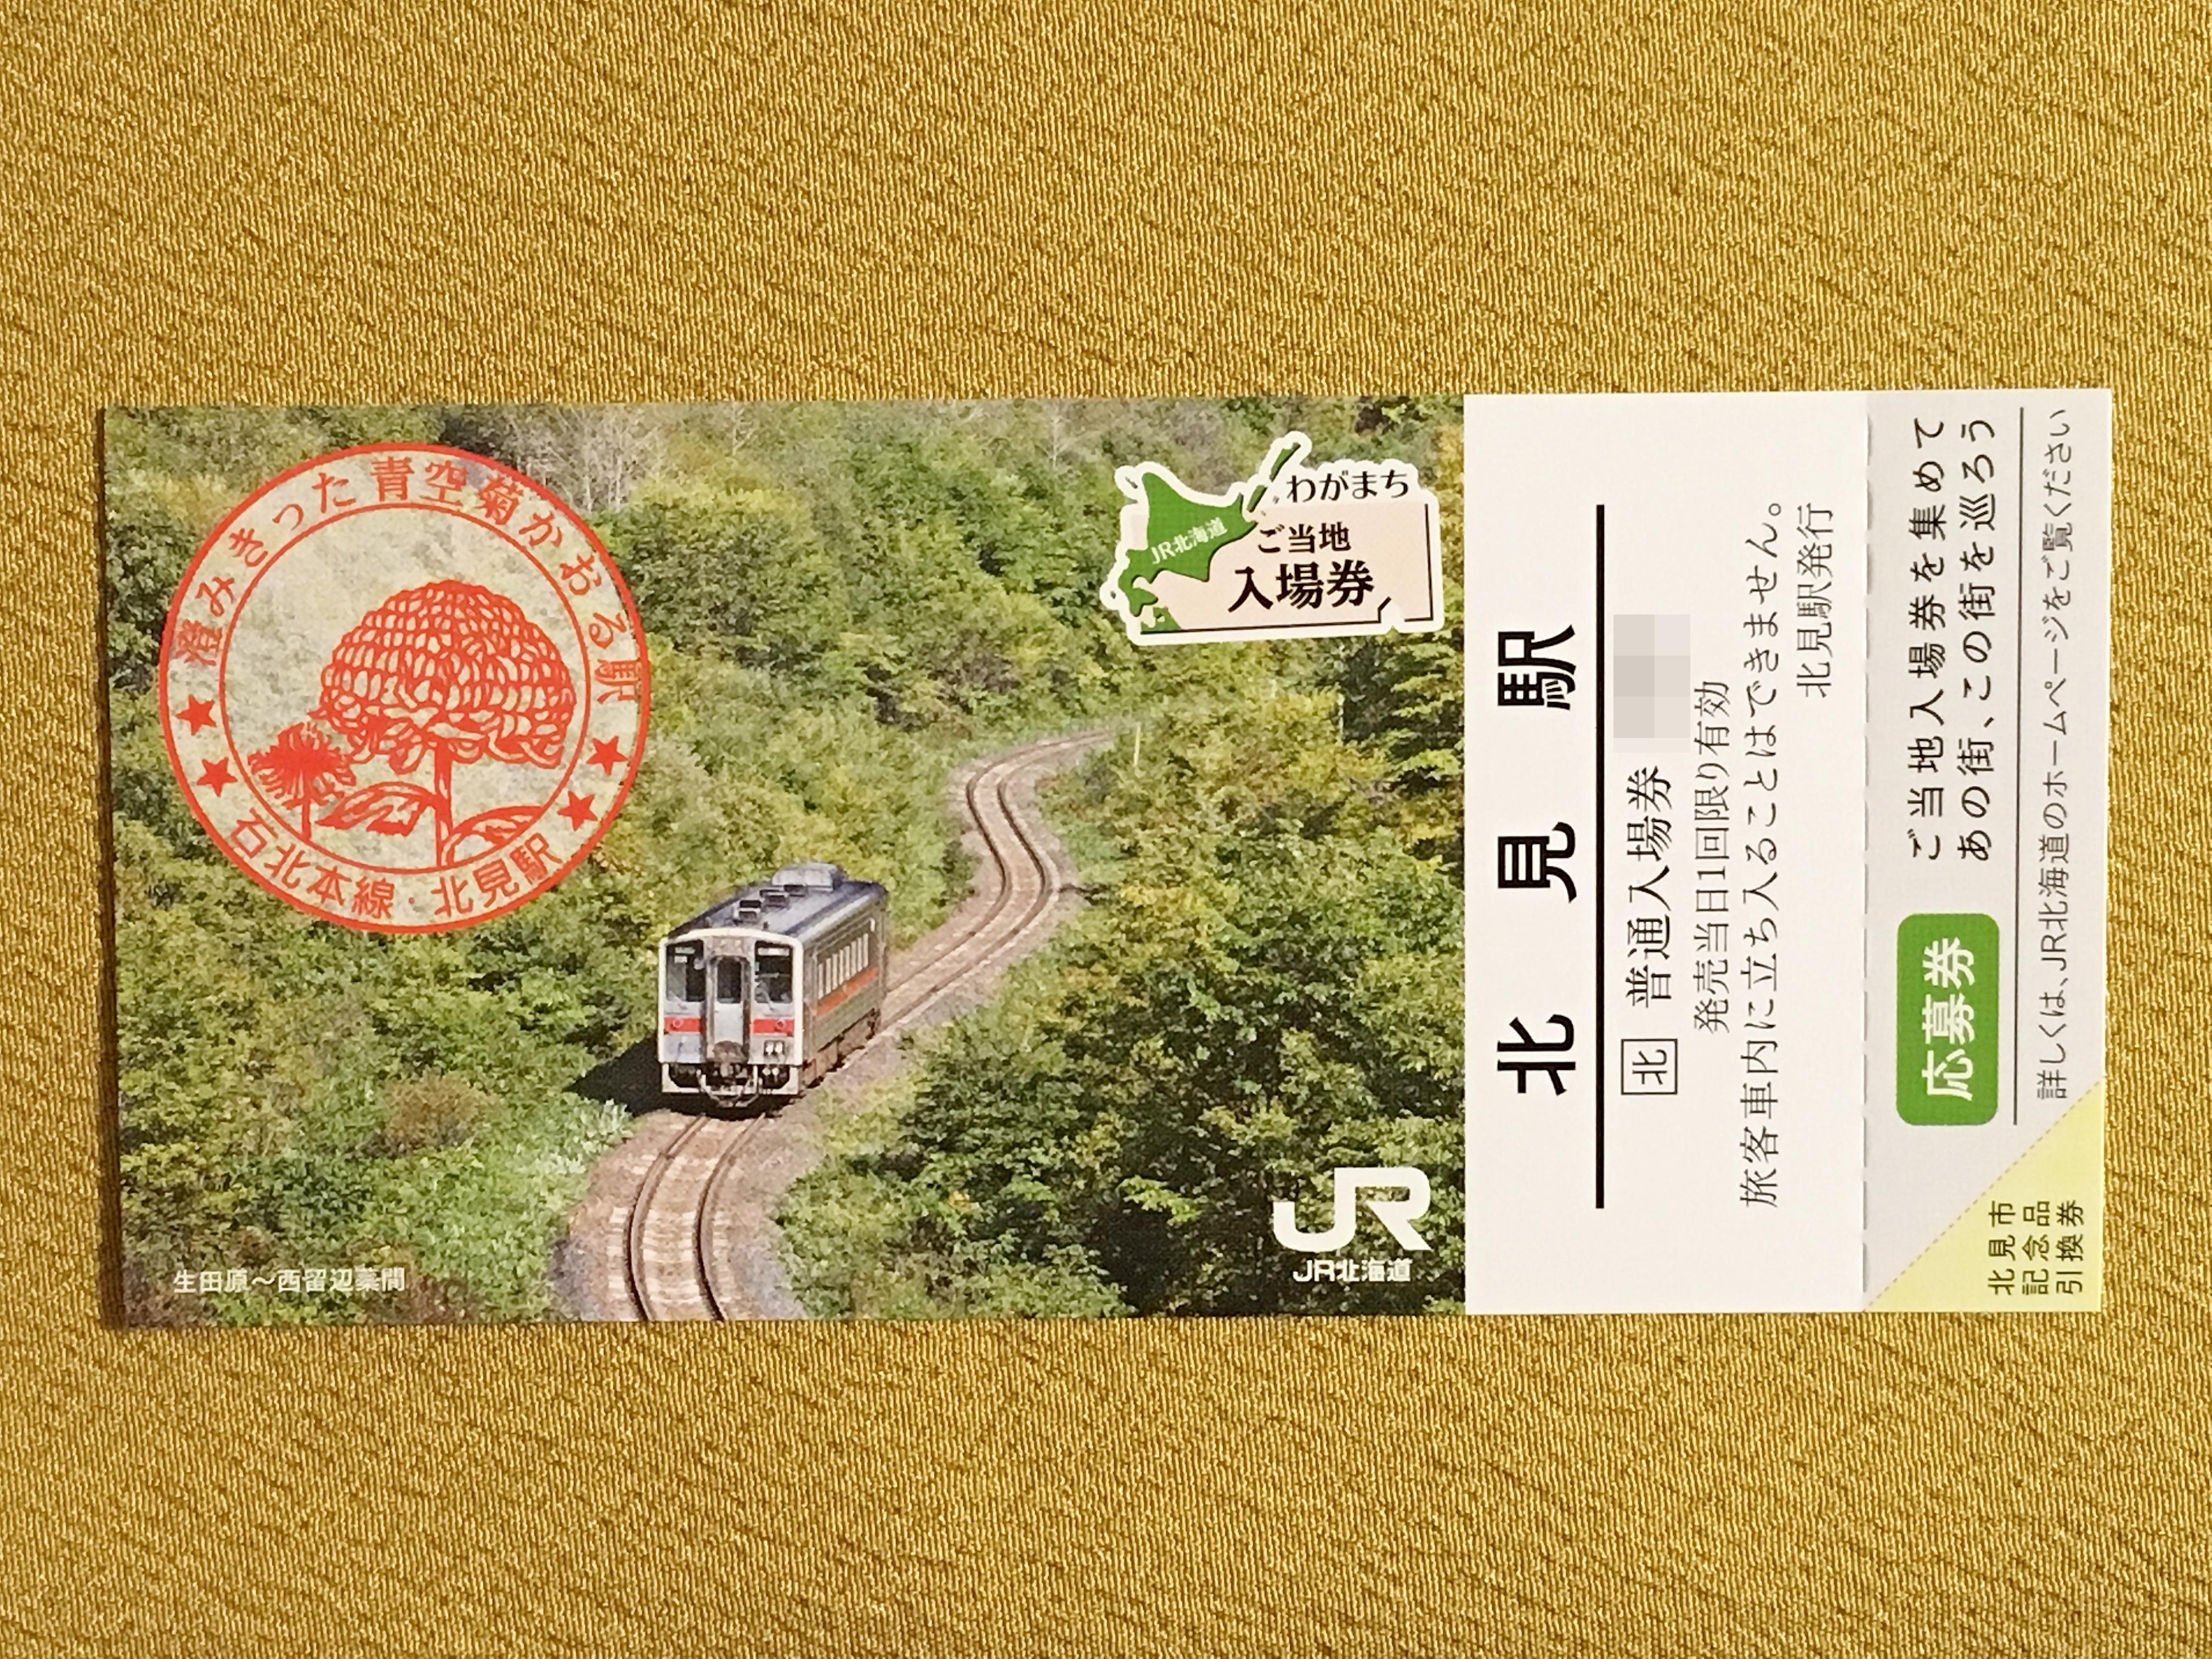 JR北海道ご当地入場券  北見駅表.JPG